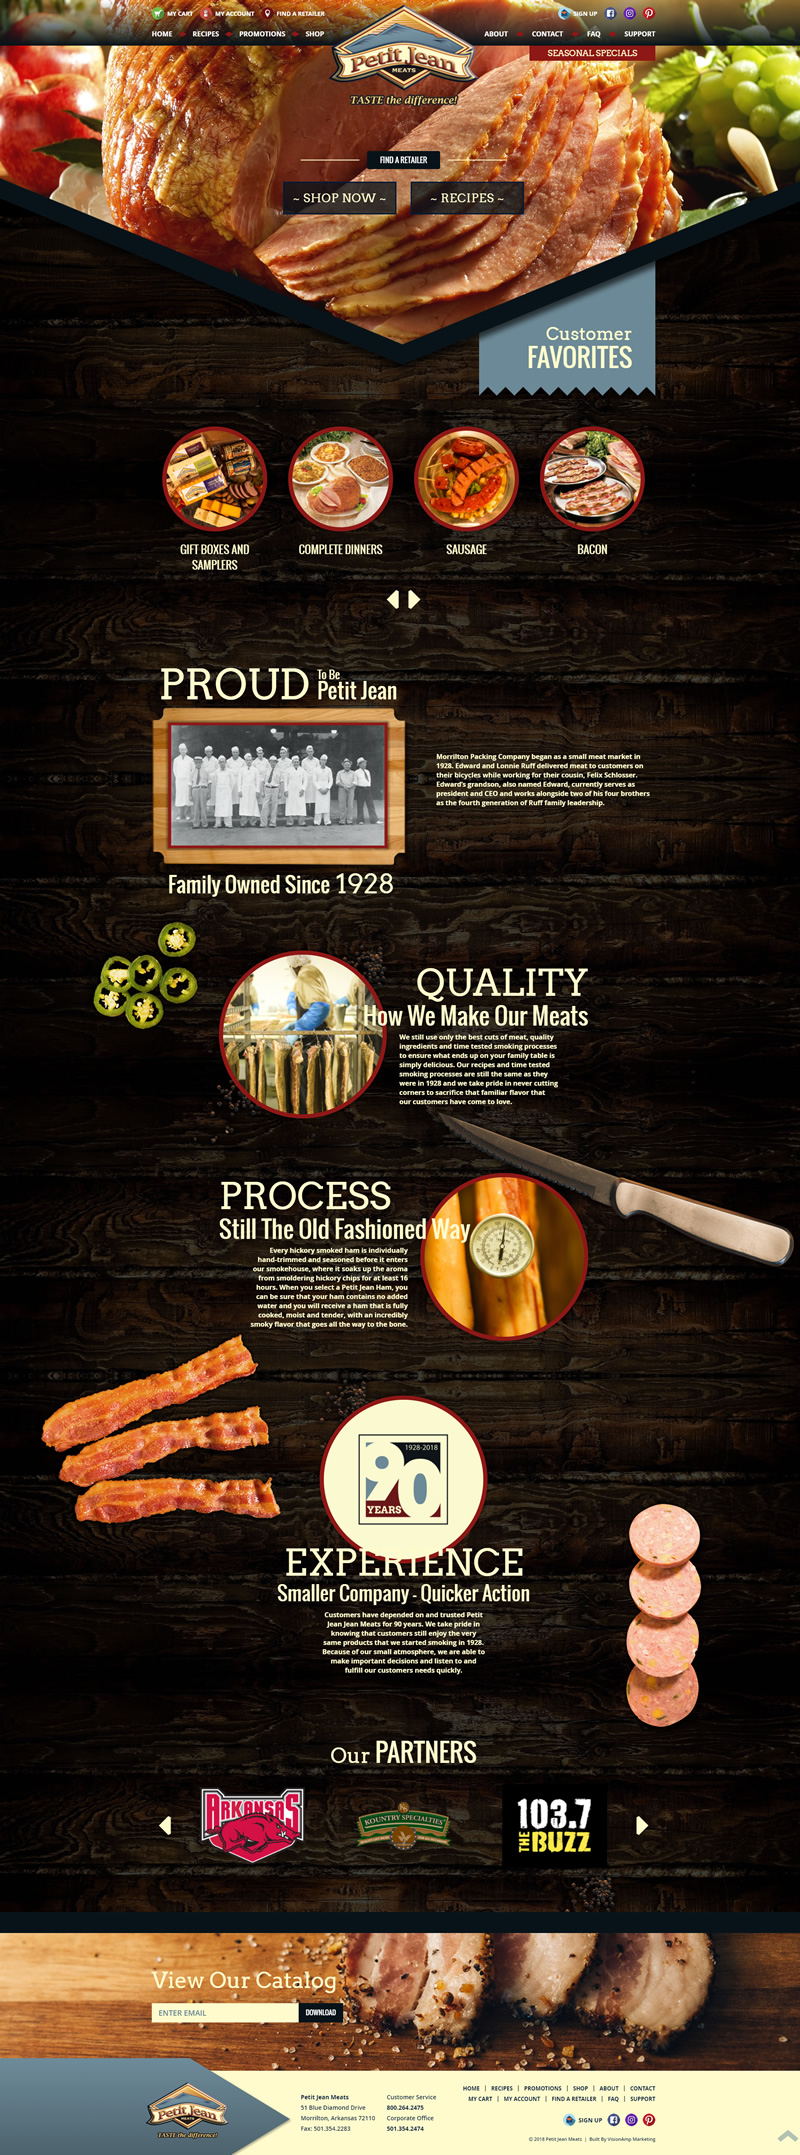 Petit Jean Meats Full Web Design Image